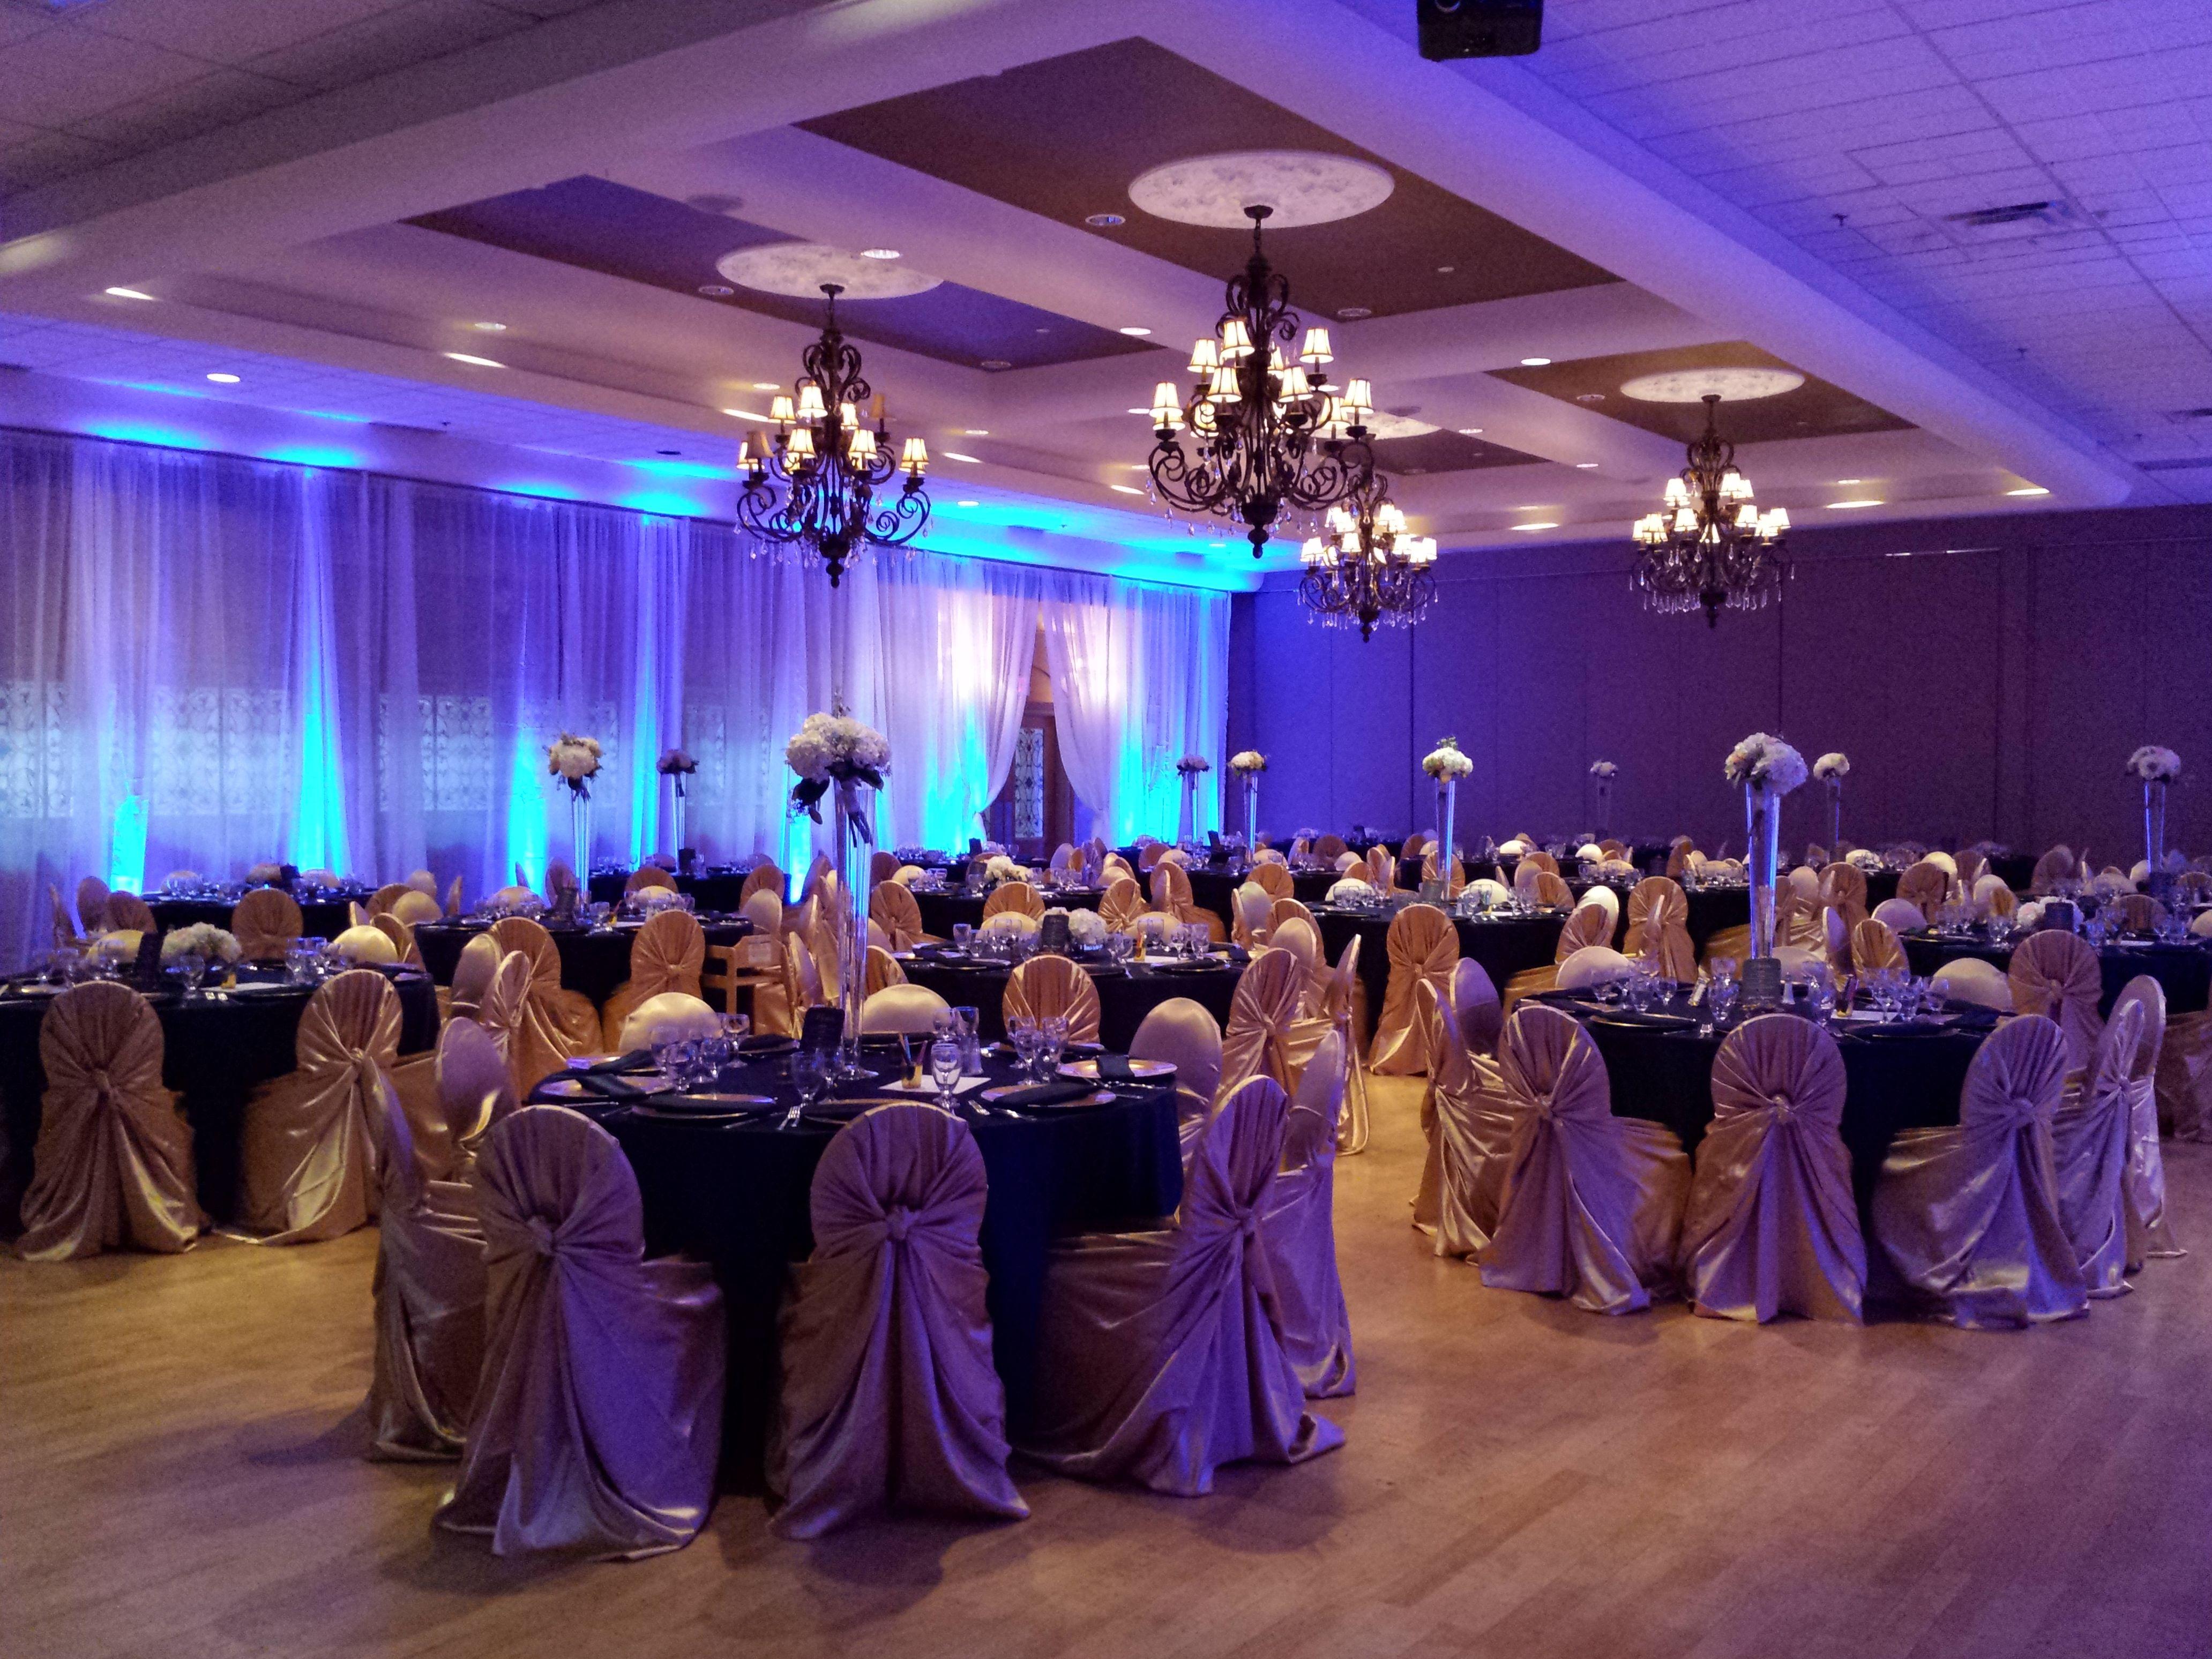 Story Weddings & Events wedding reception decor edmonton yeg